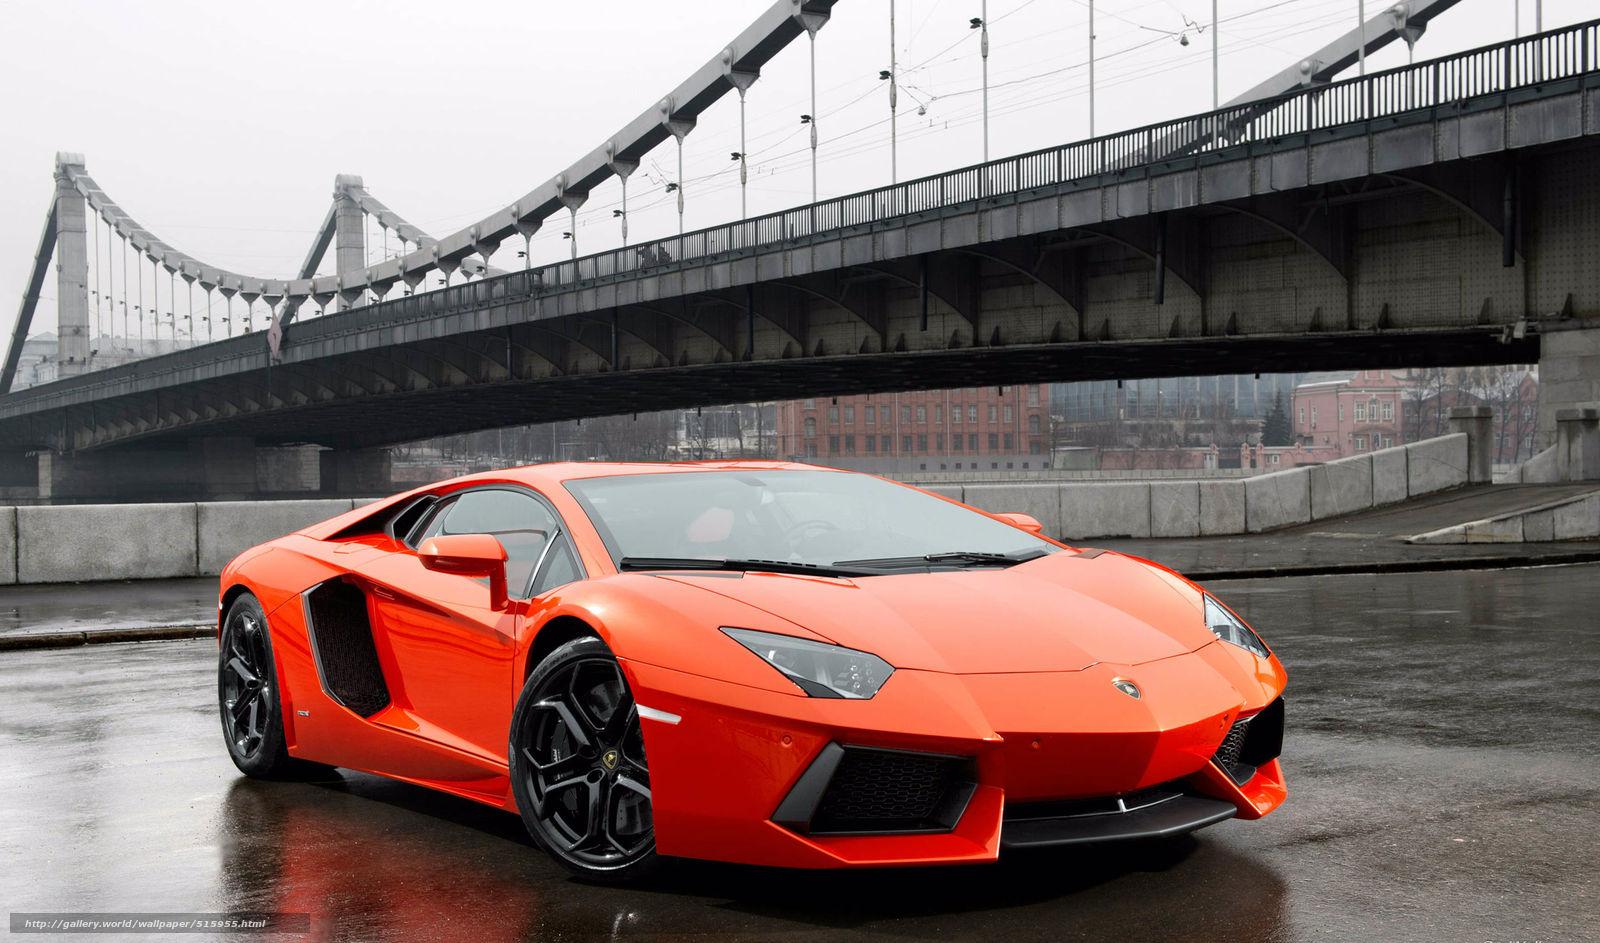 Tlcharger Fond D Ecran Orange Pont Lamborghini